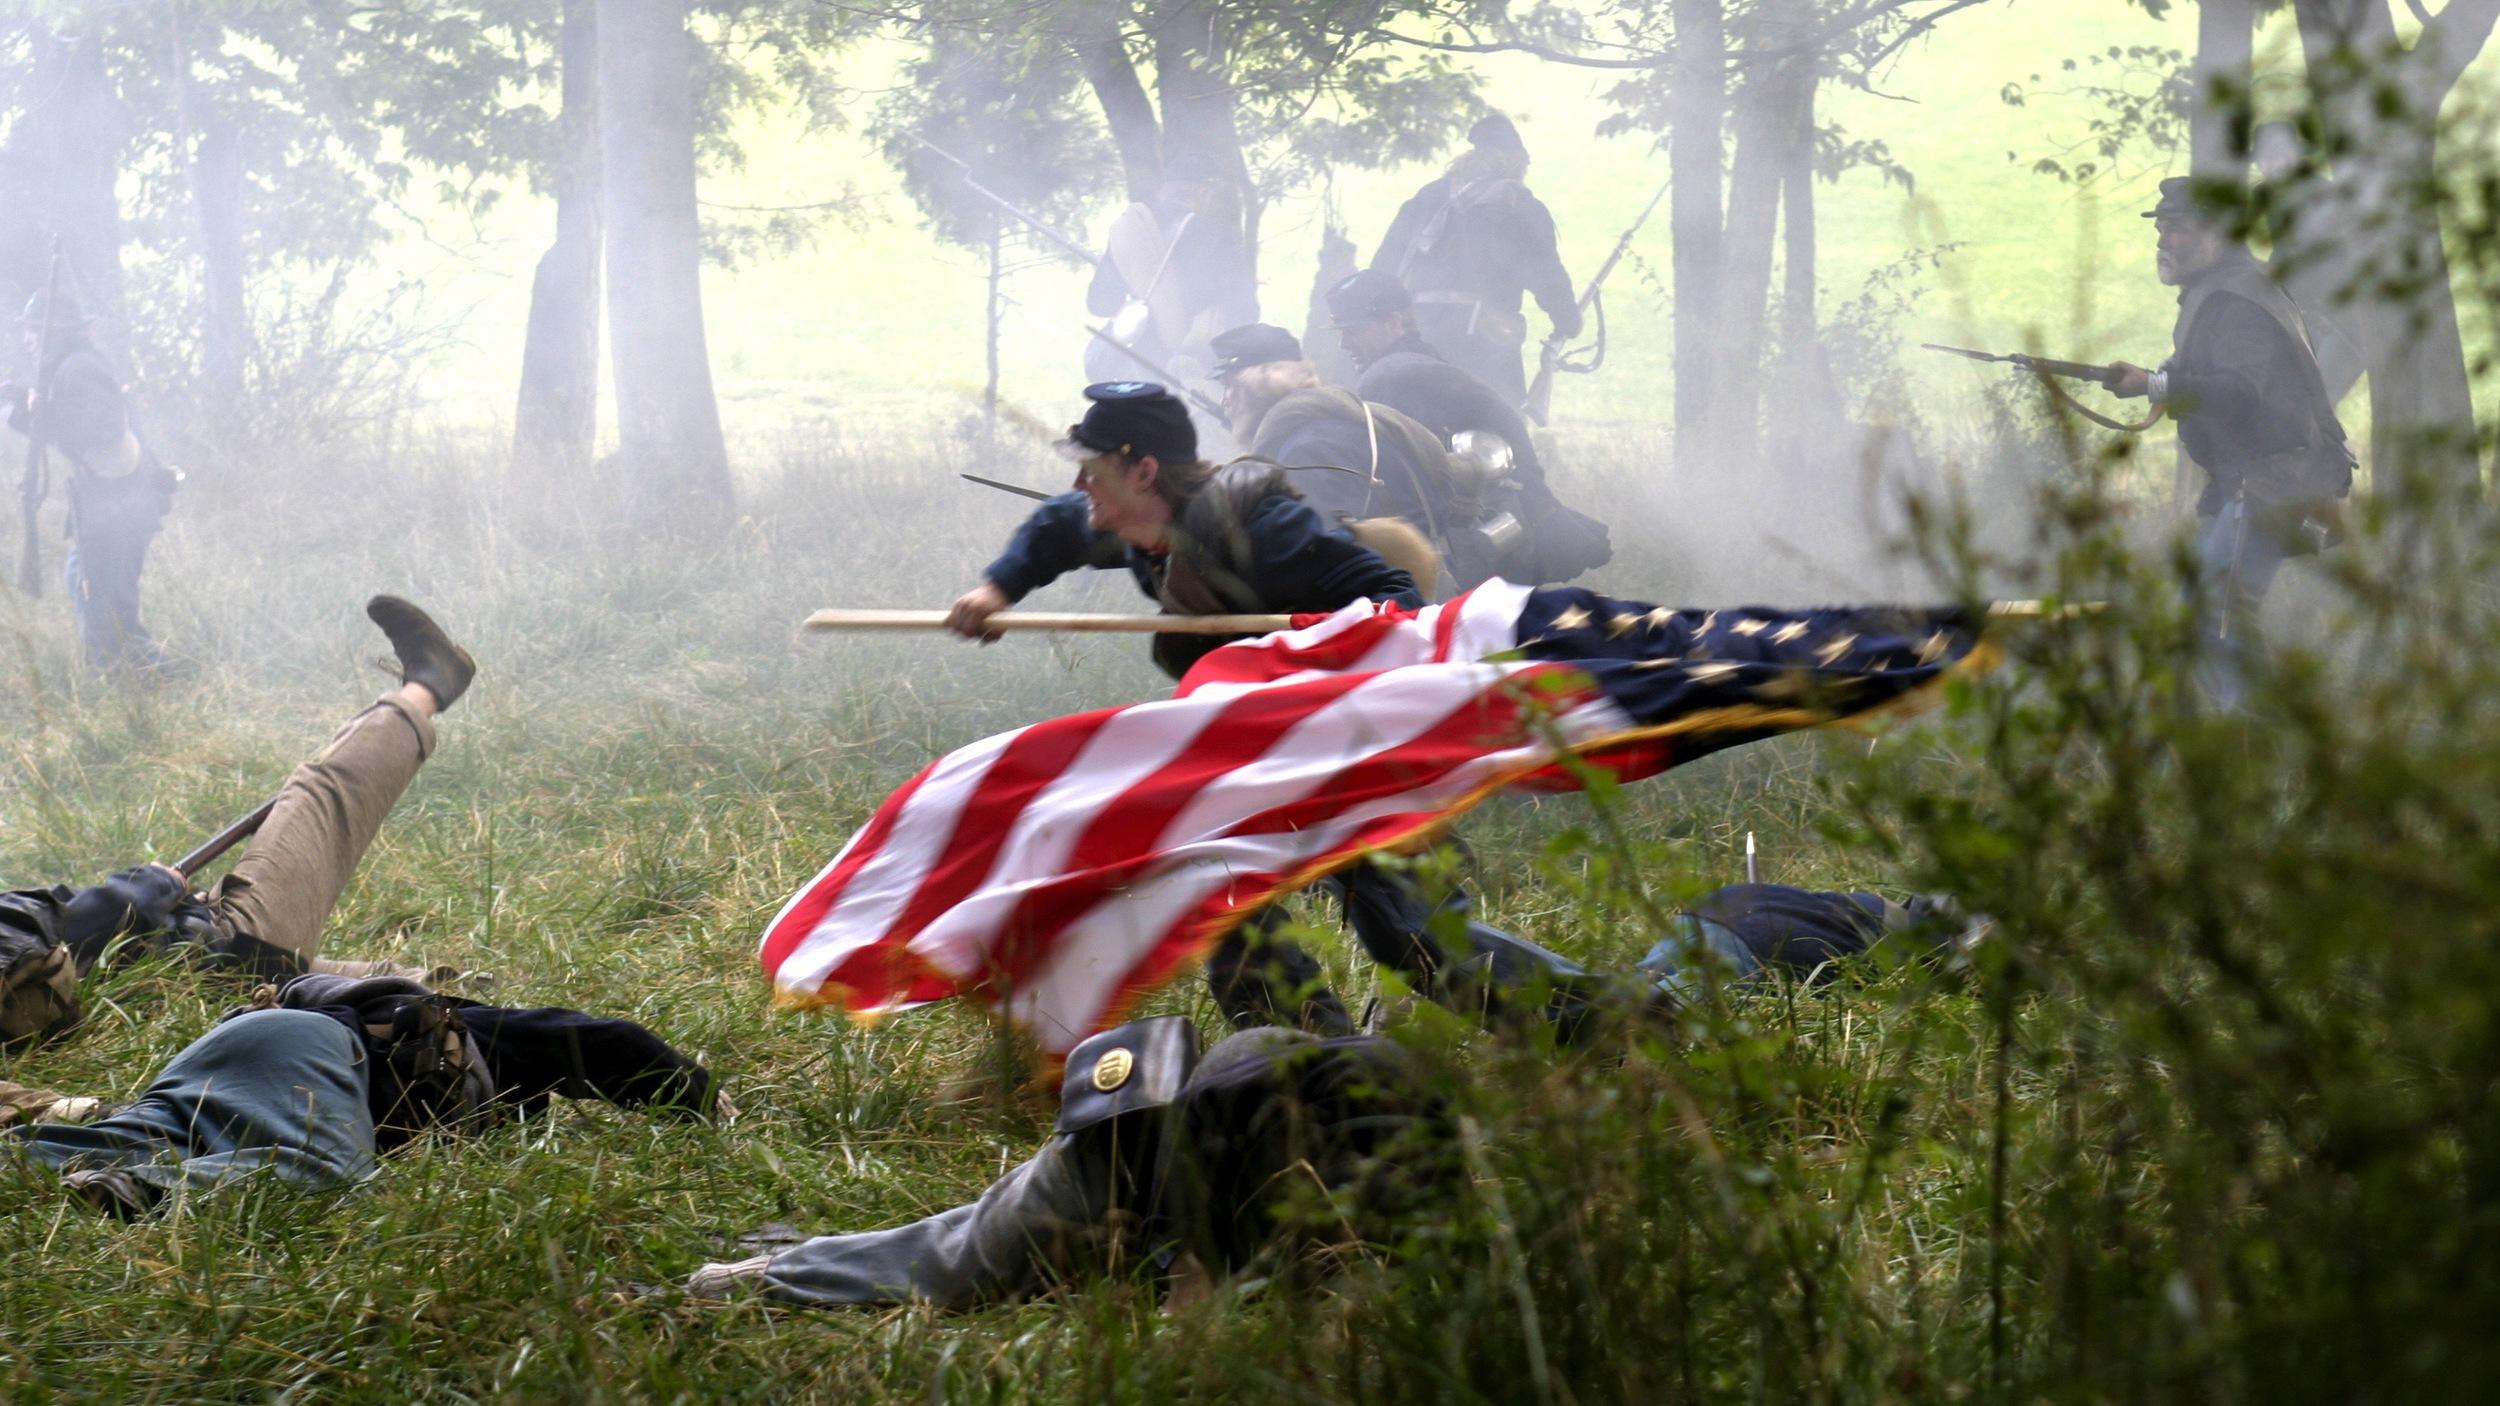 civil war image 3.jpg